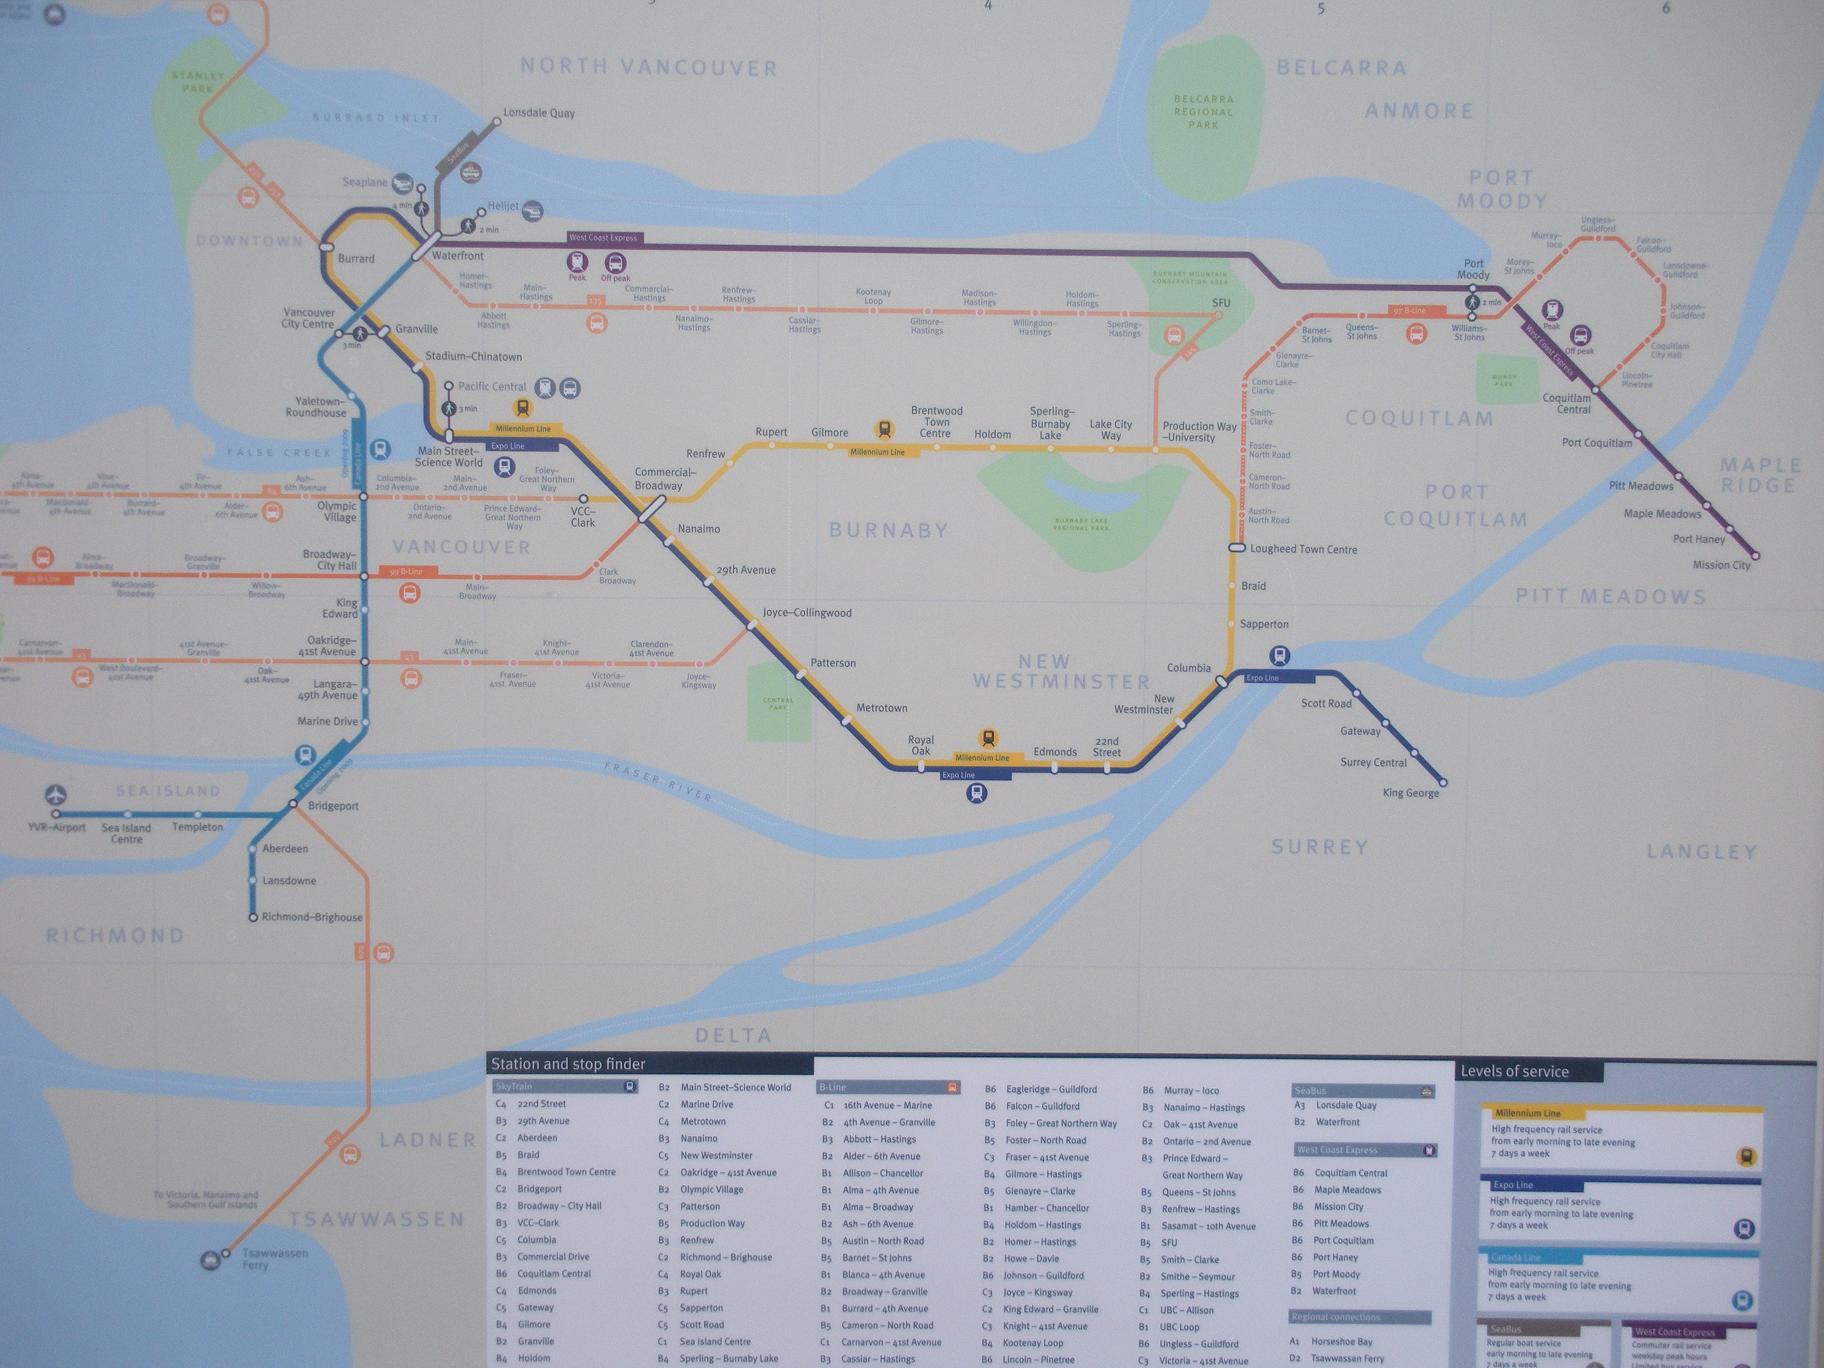 Translink bus schedule phone number-9530